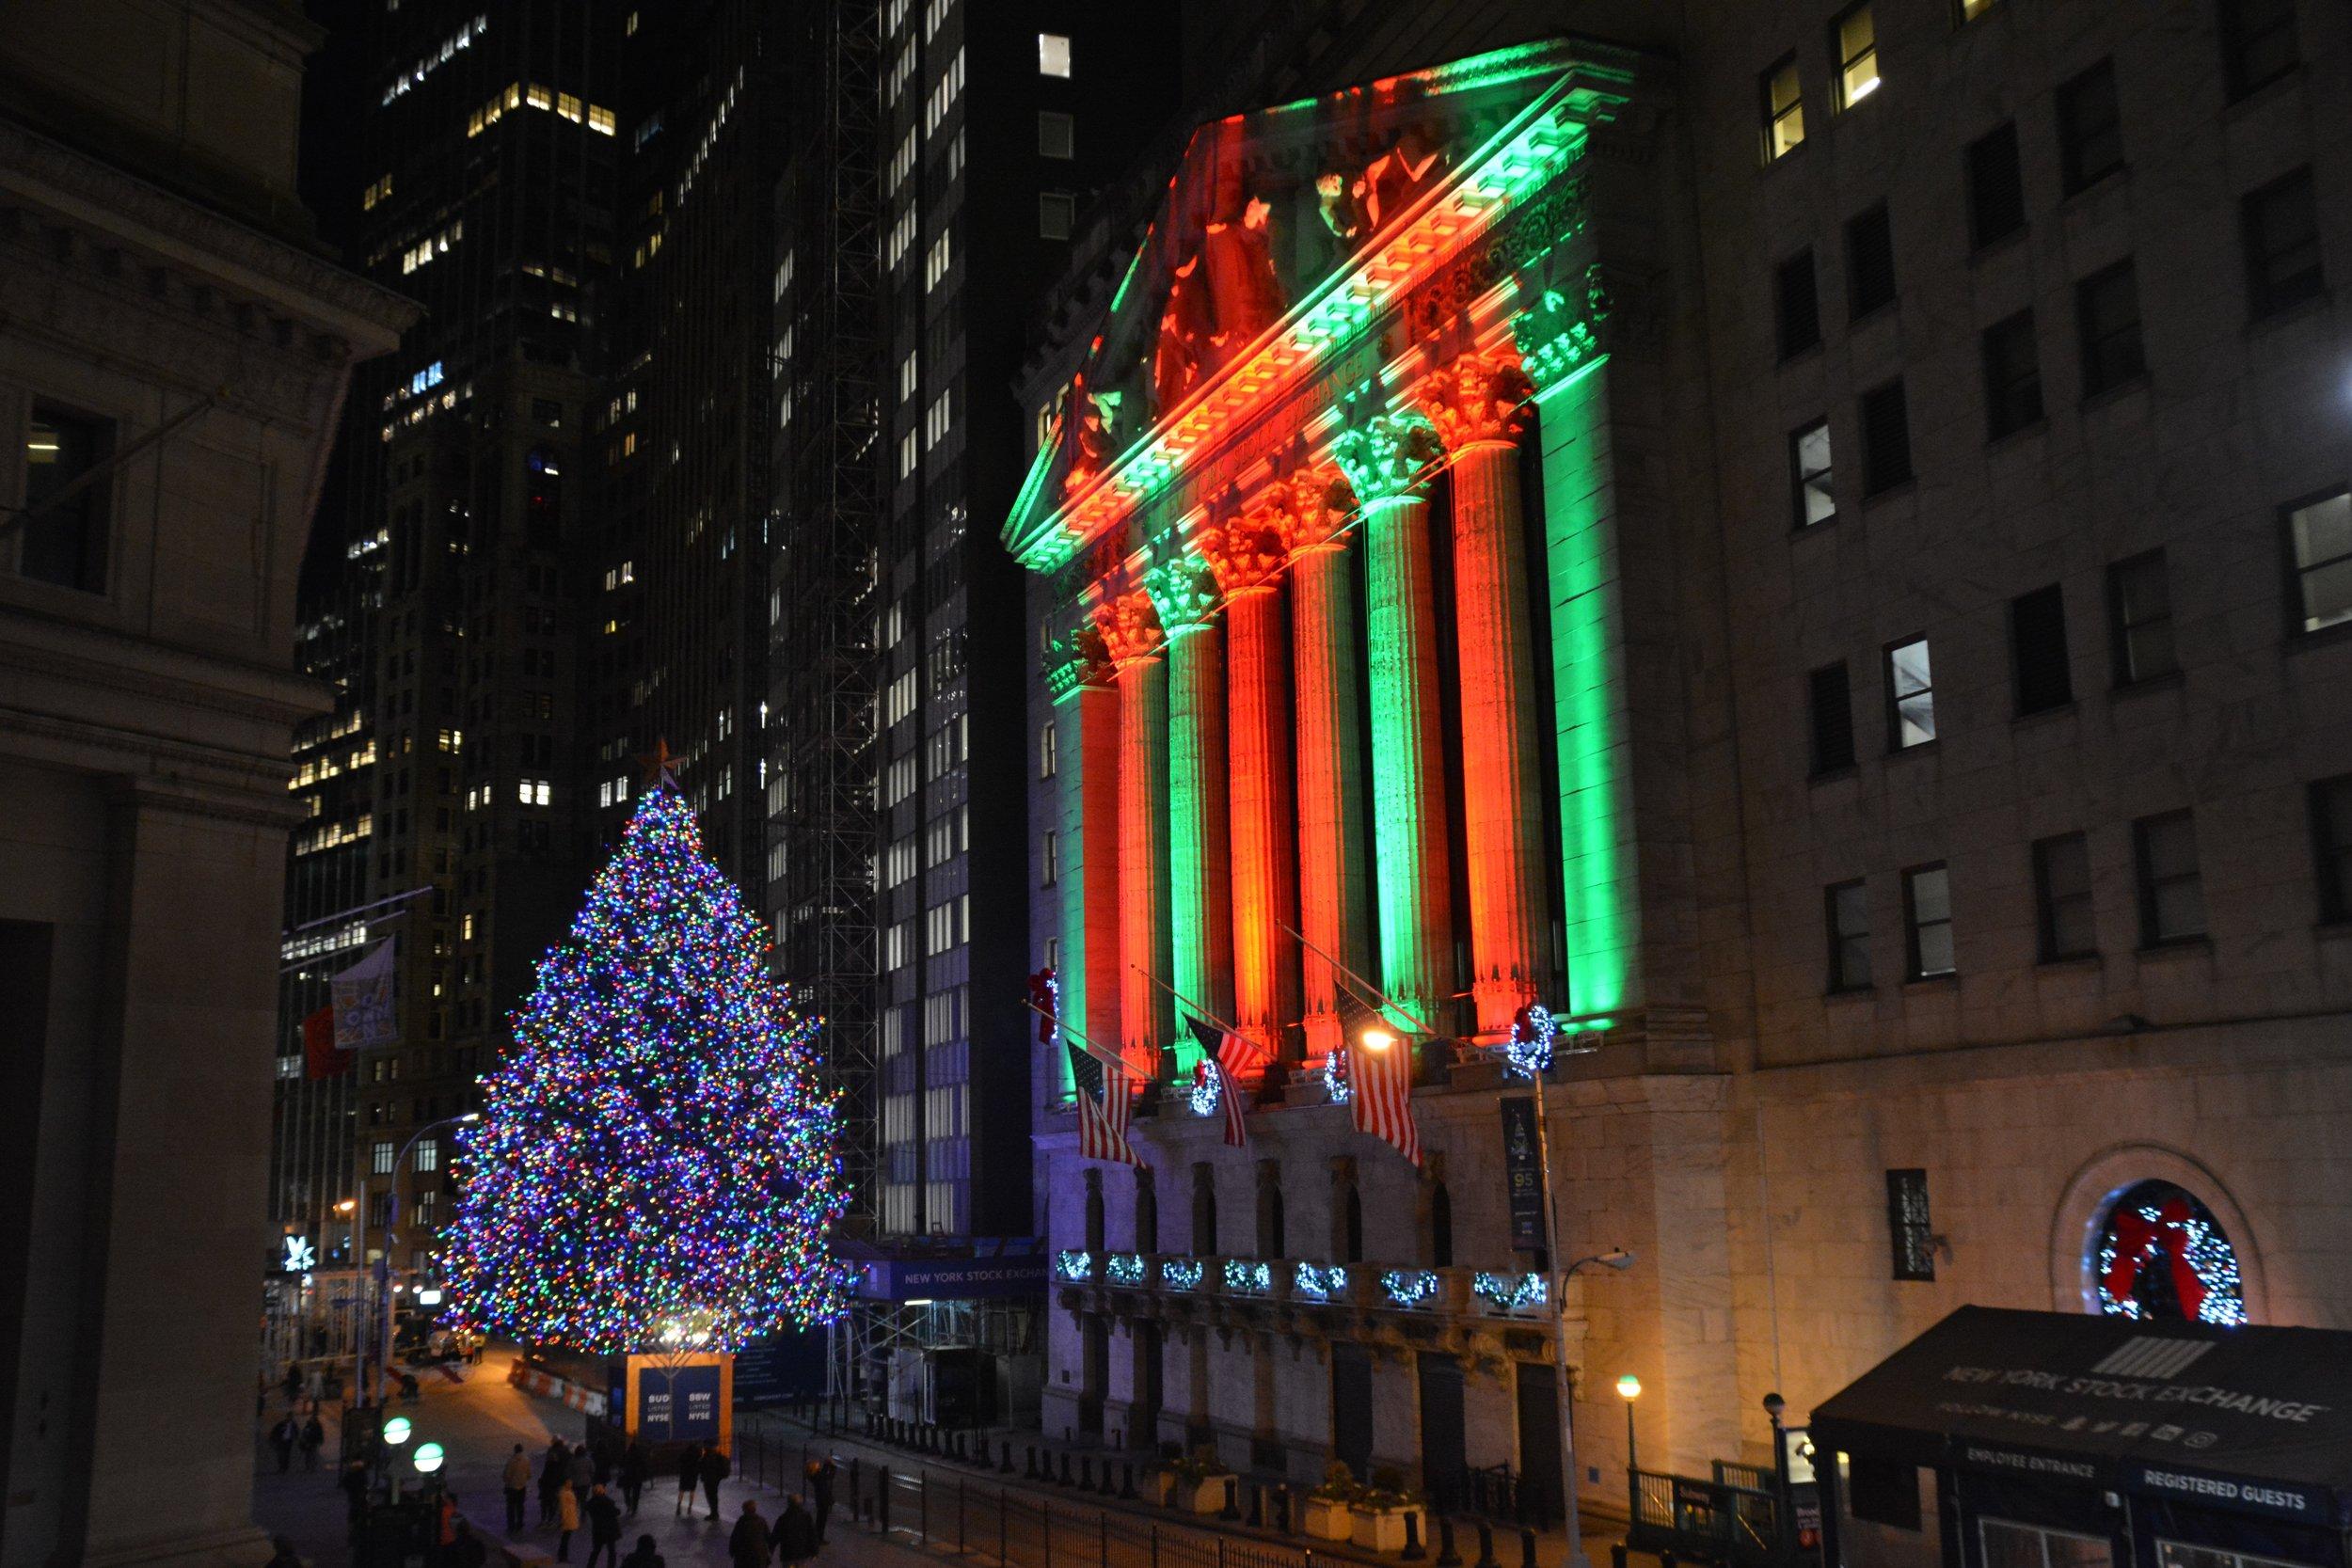 2018_NYSE_WAMVentures_HappyHolidays_NKN_6014.jpg